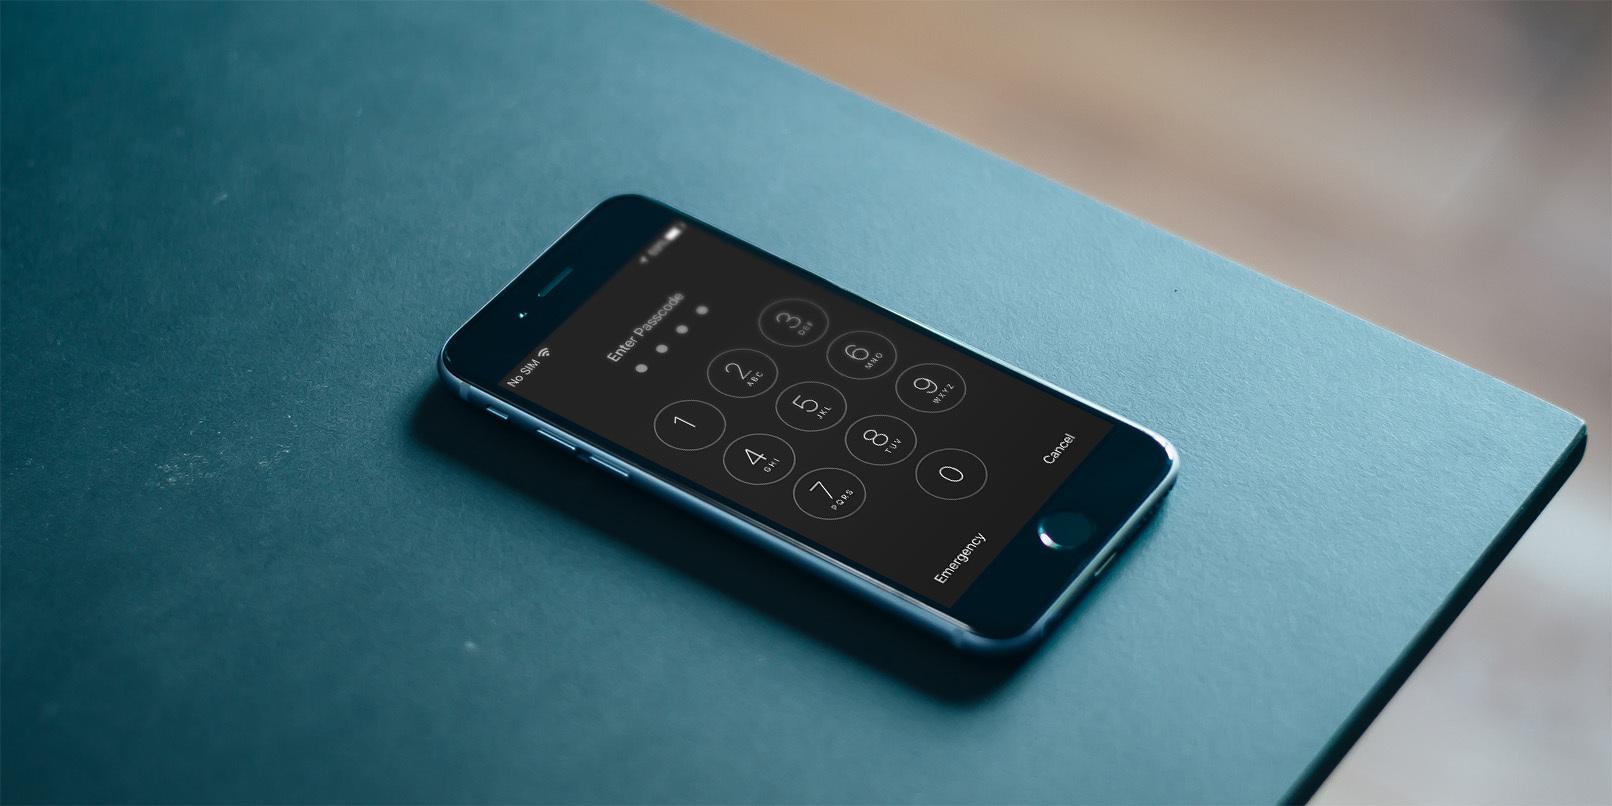 This is how the FBI unlocked the San Bernardino shooter's iPhone